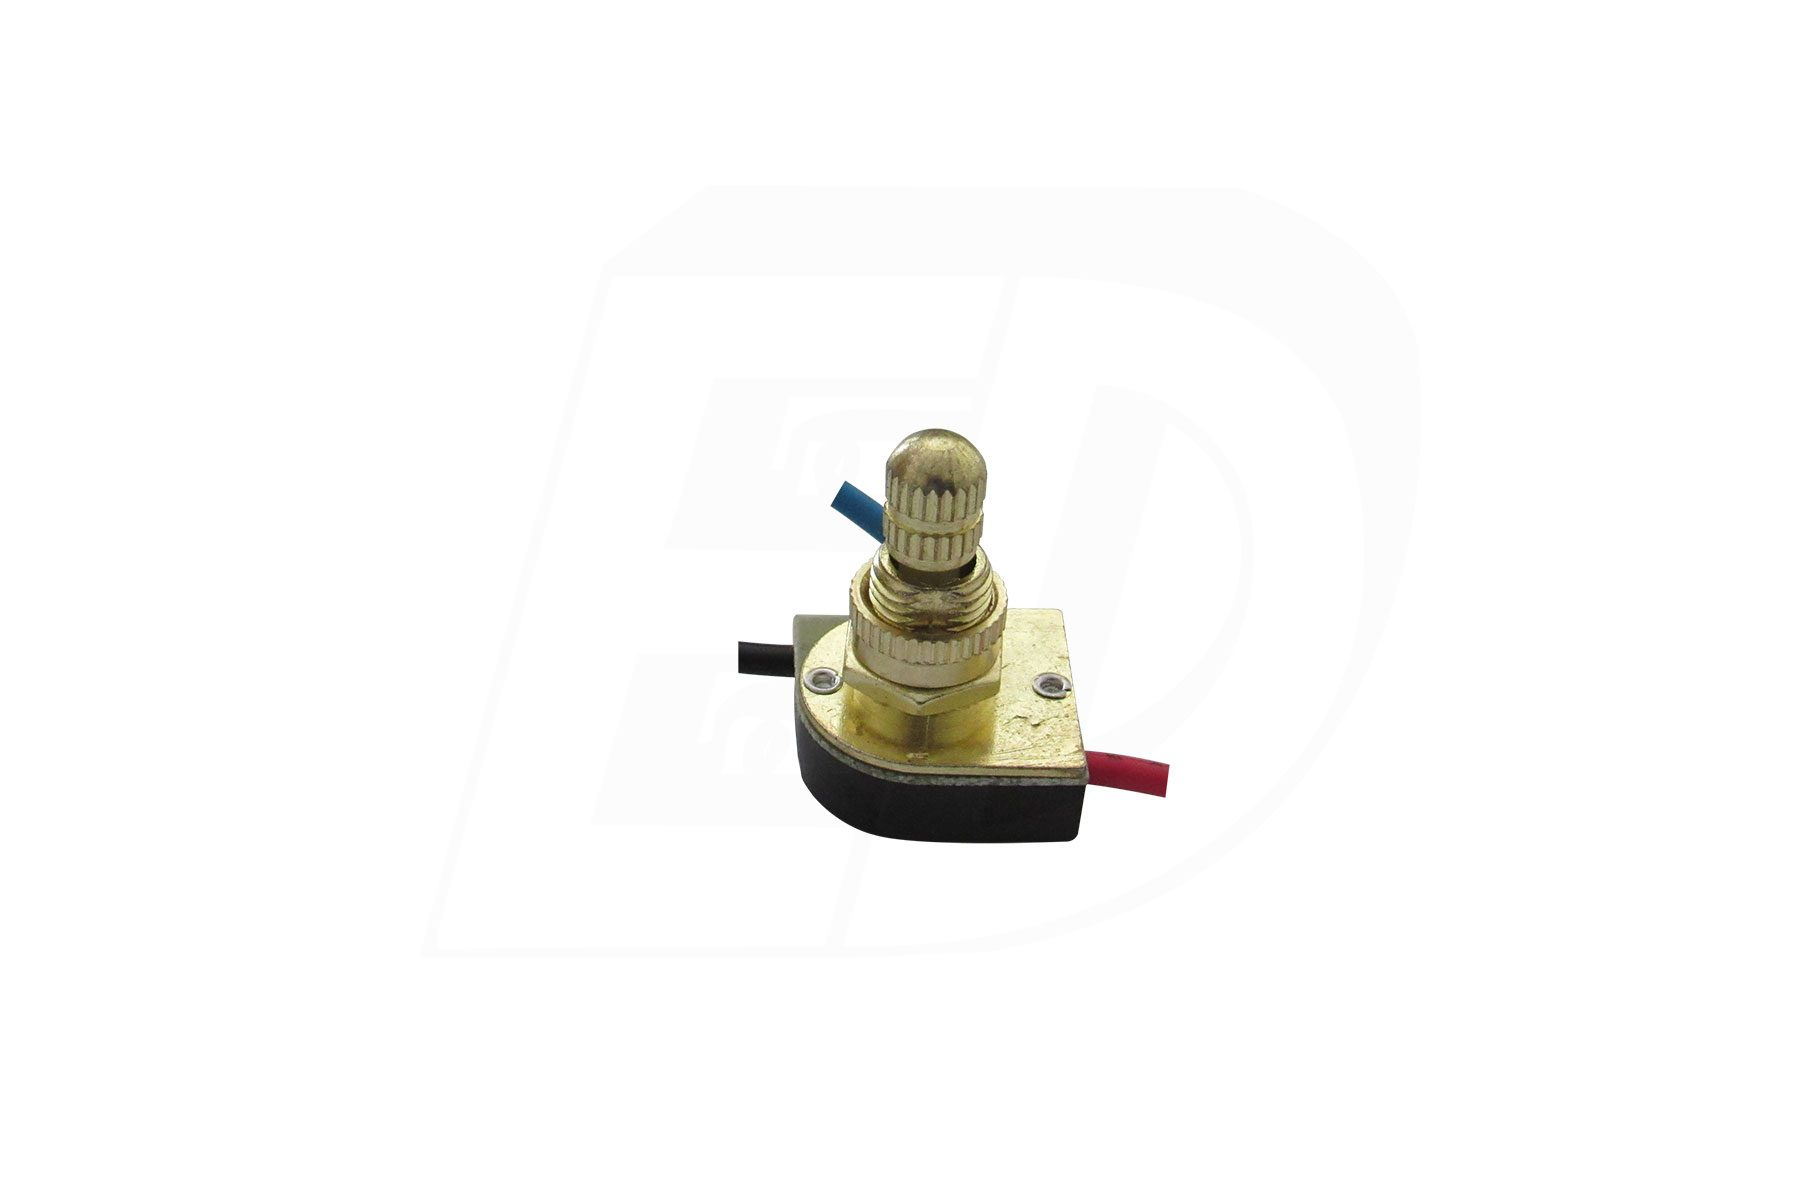 SPST Rotary Lamp Switch